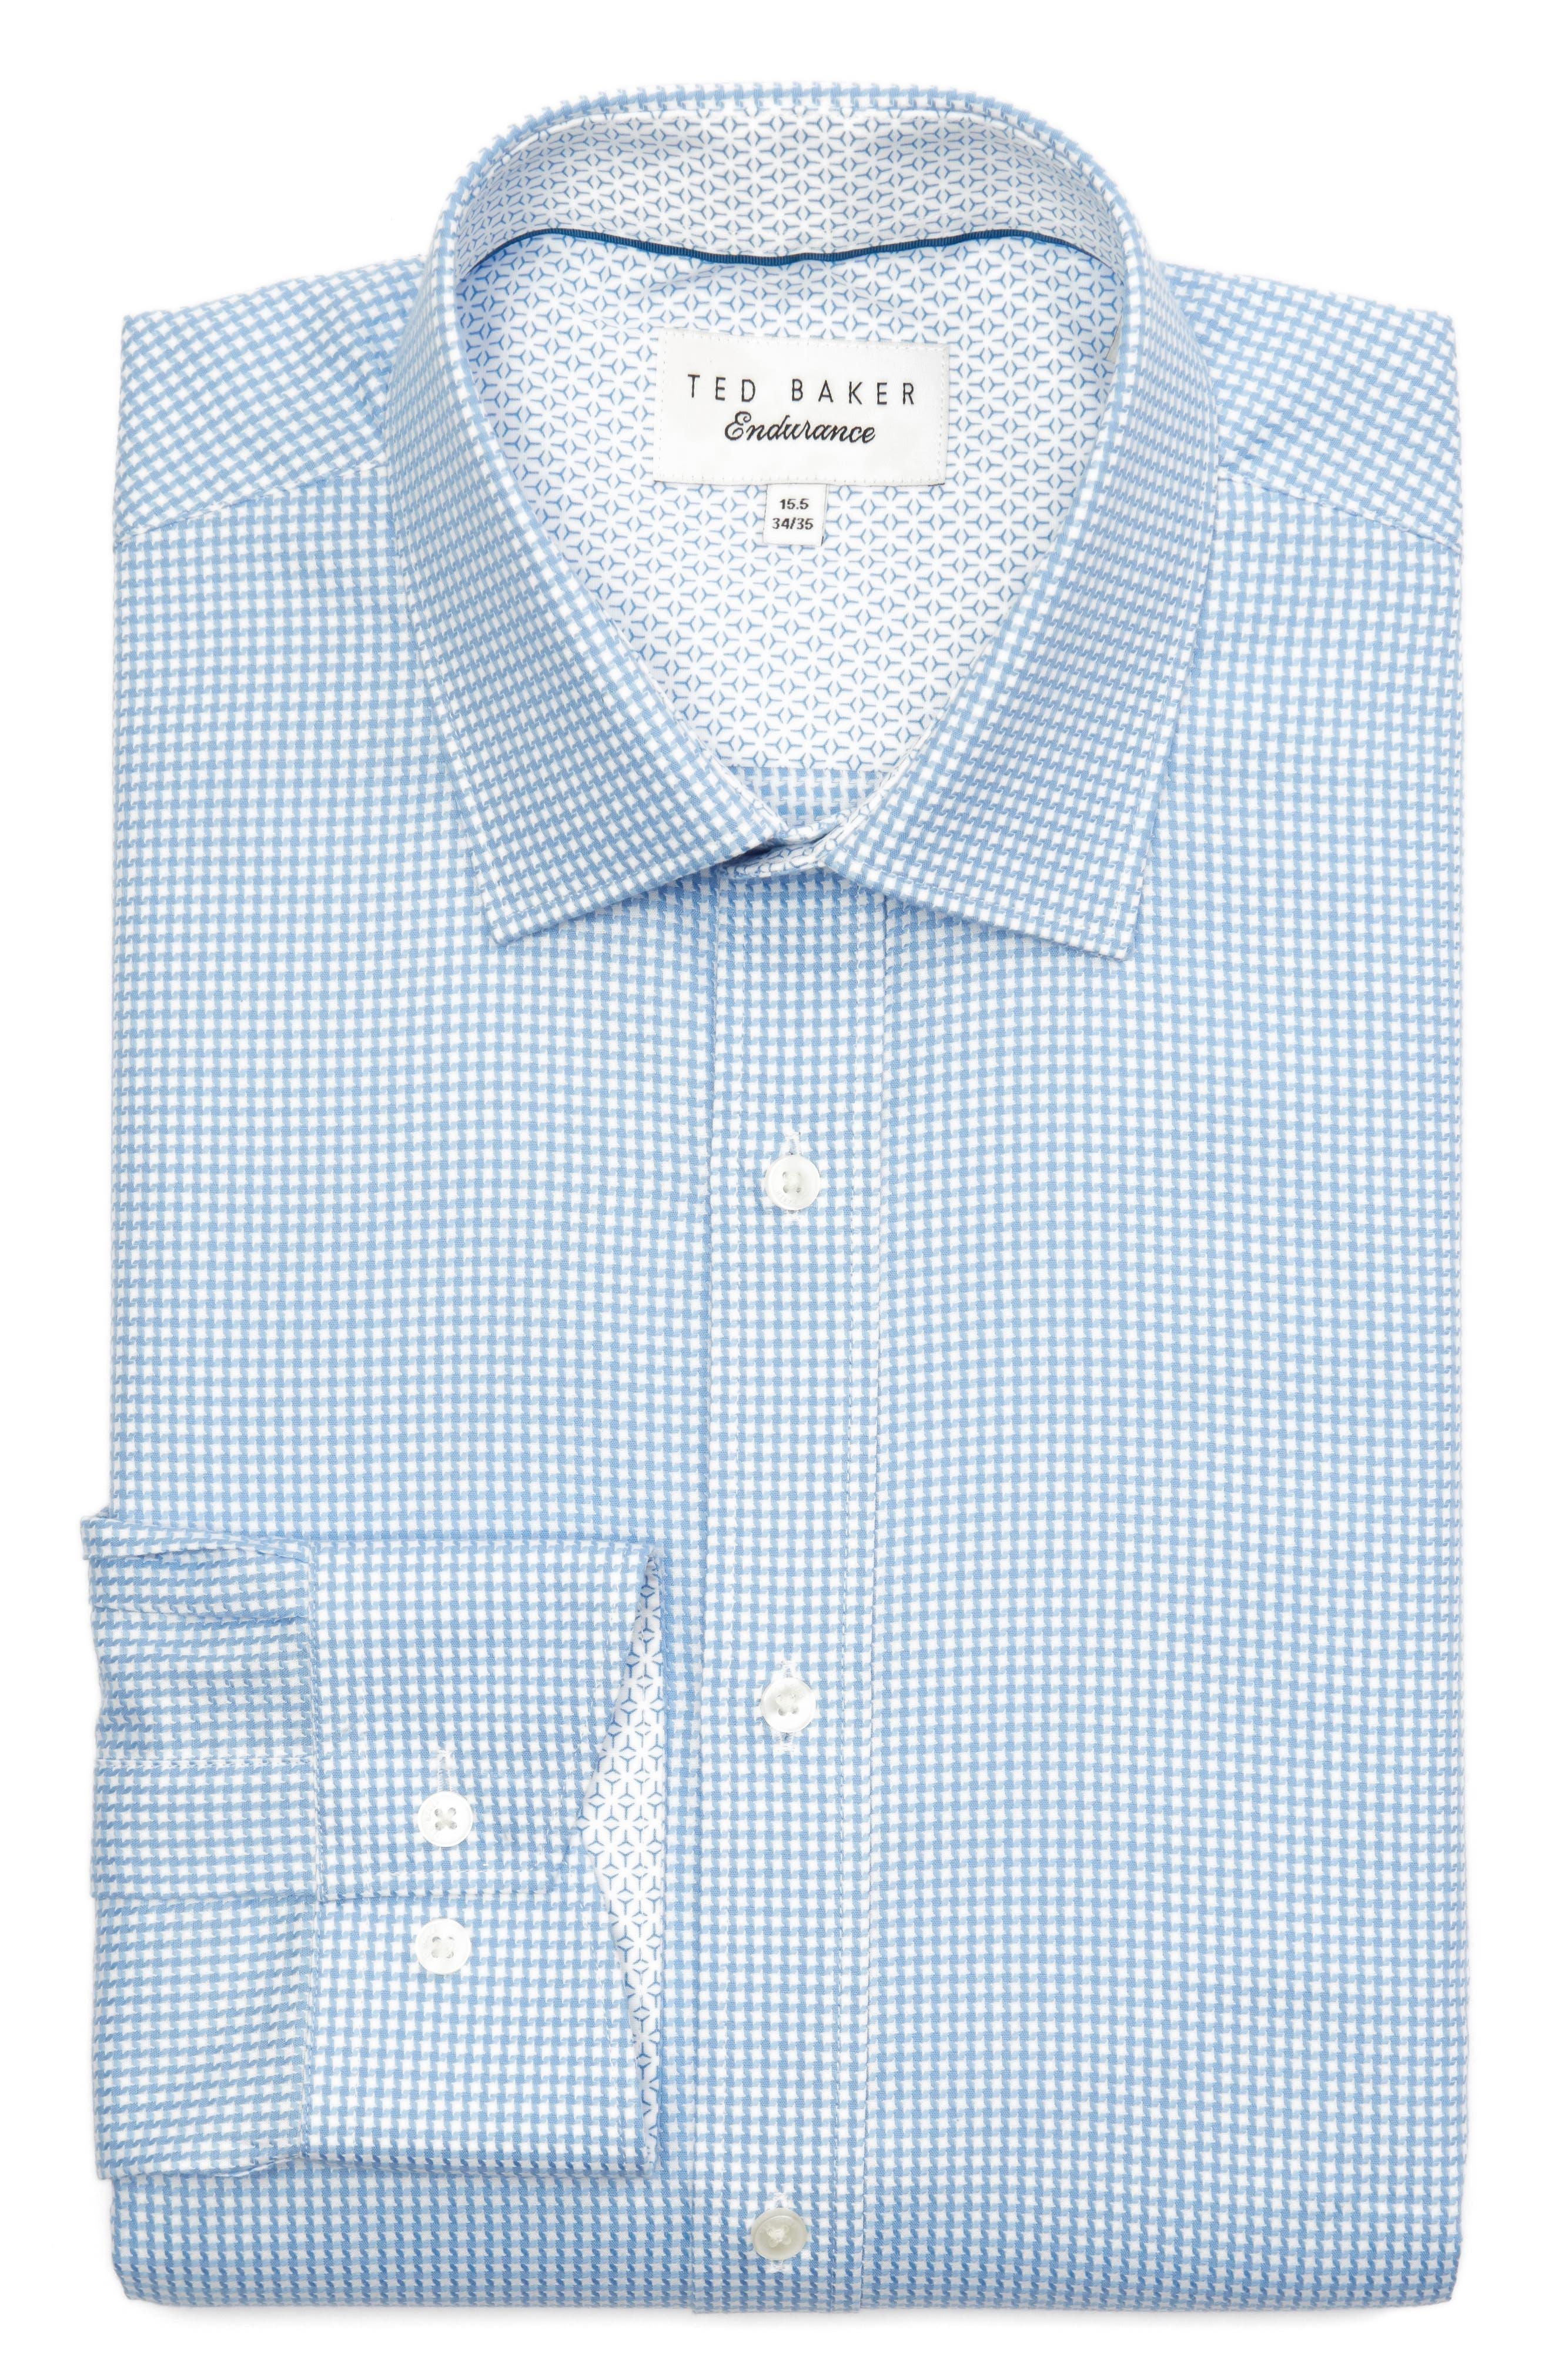 Jaiden Trim Fit Houndstooth Dress Shirt,                             Alternate thumbnail 6, color,                             Light Blue